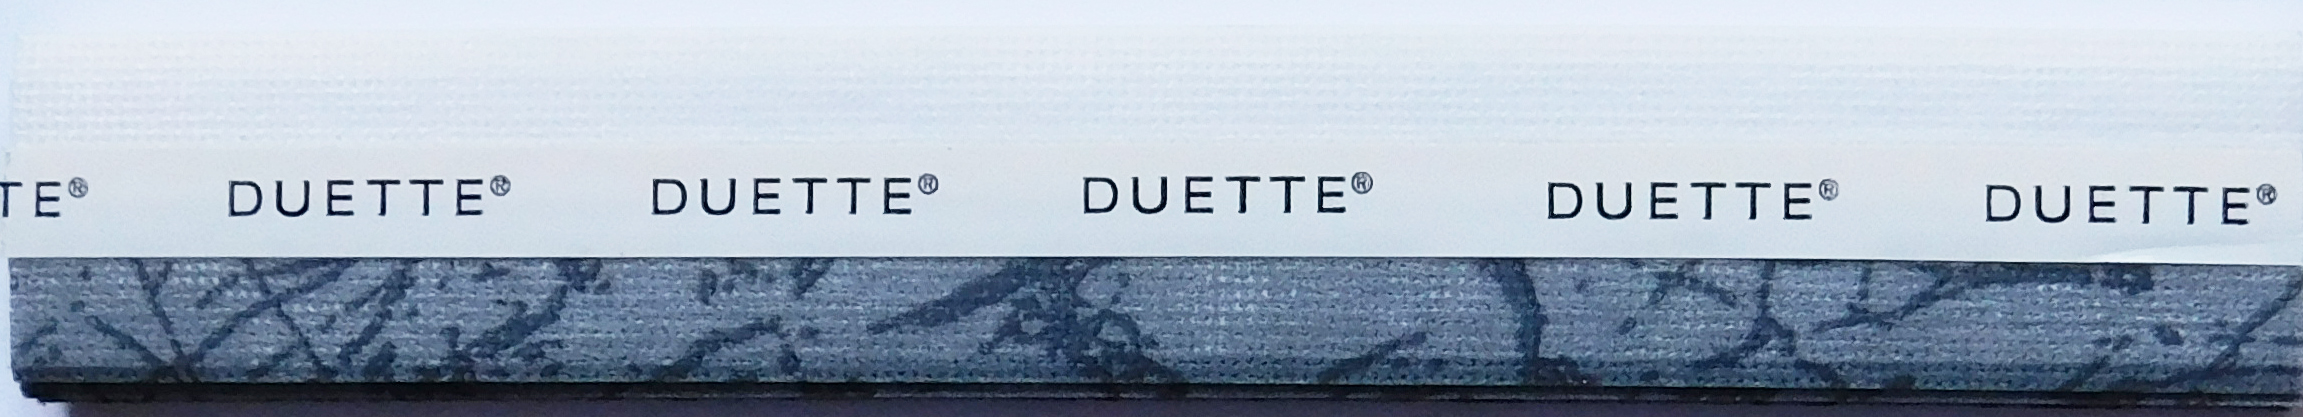 Montana Raven Duette Blind Fabric